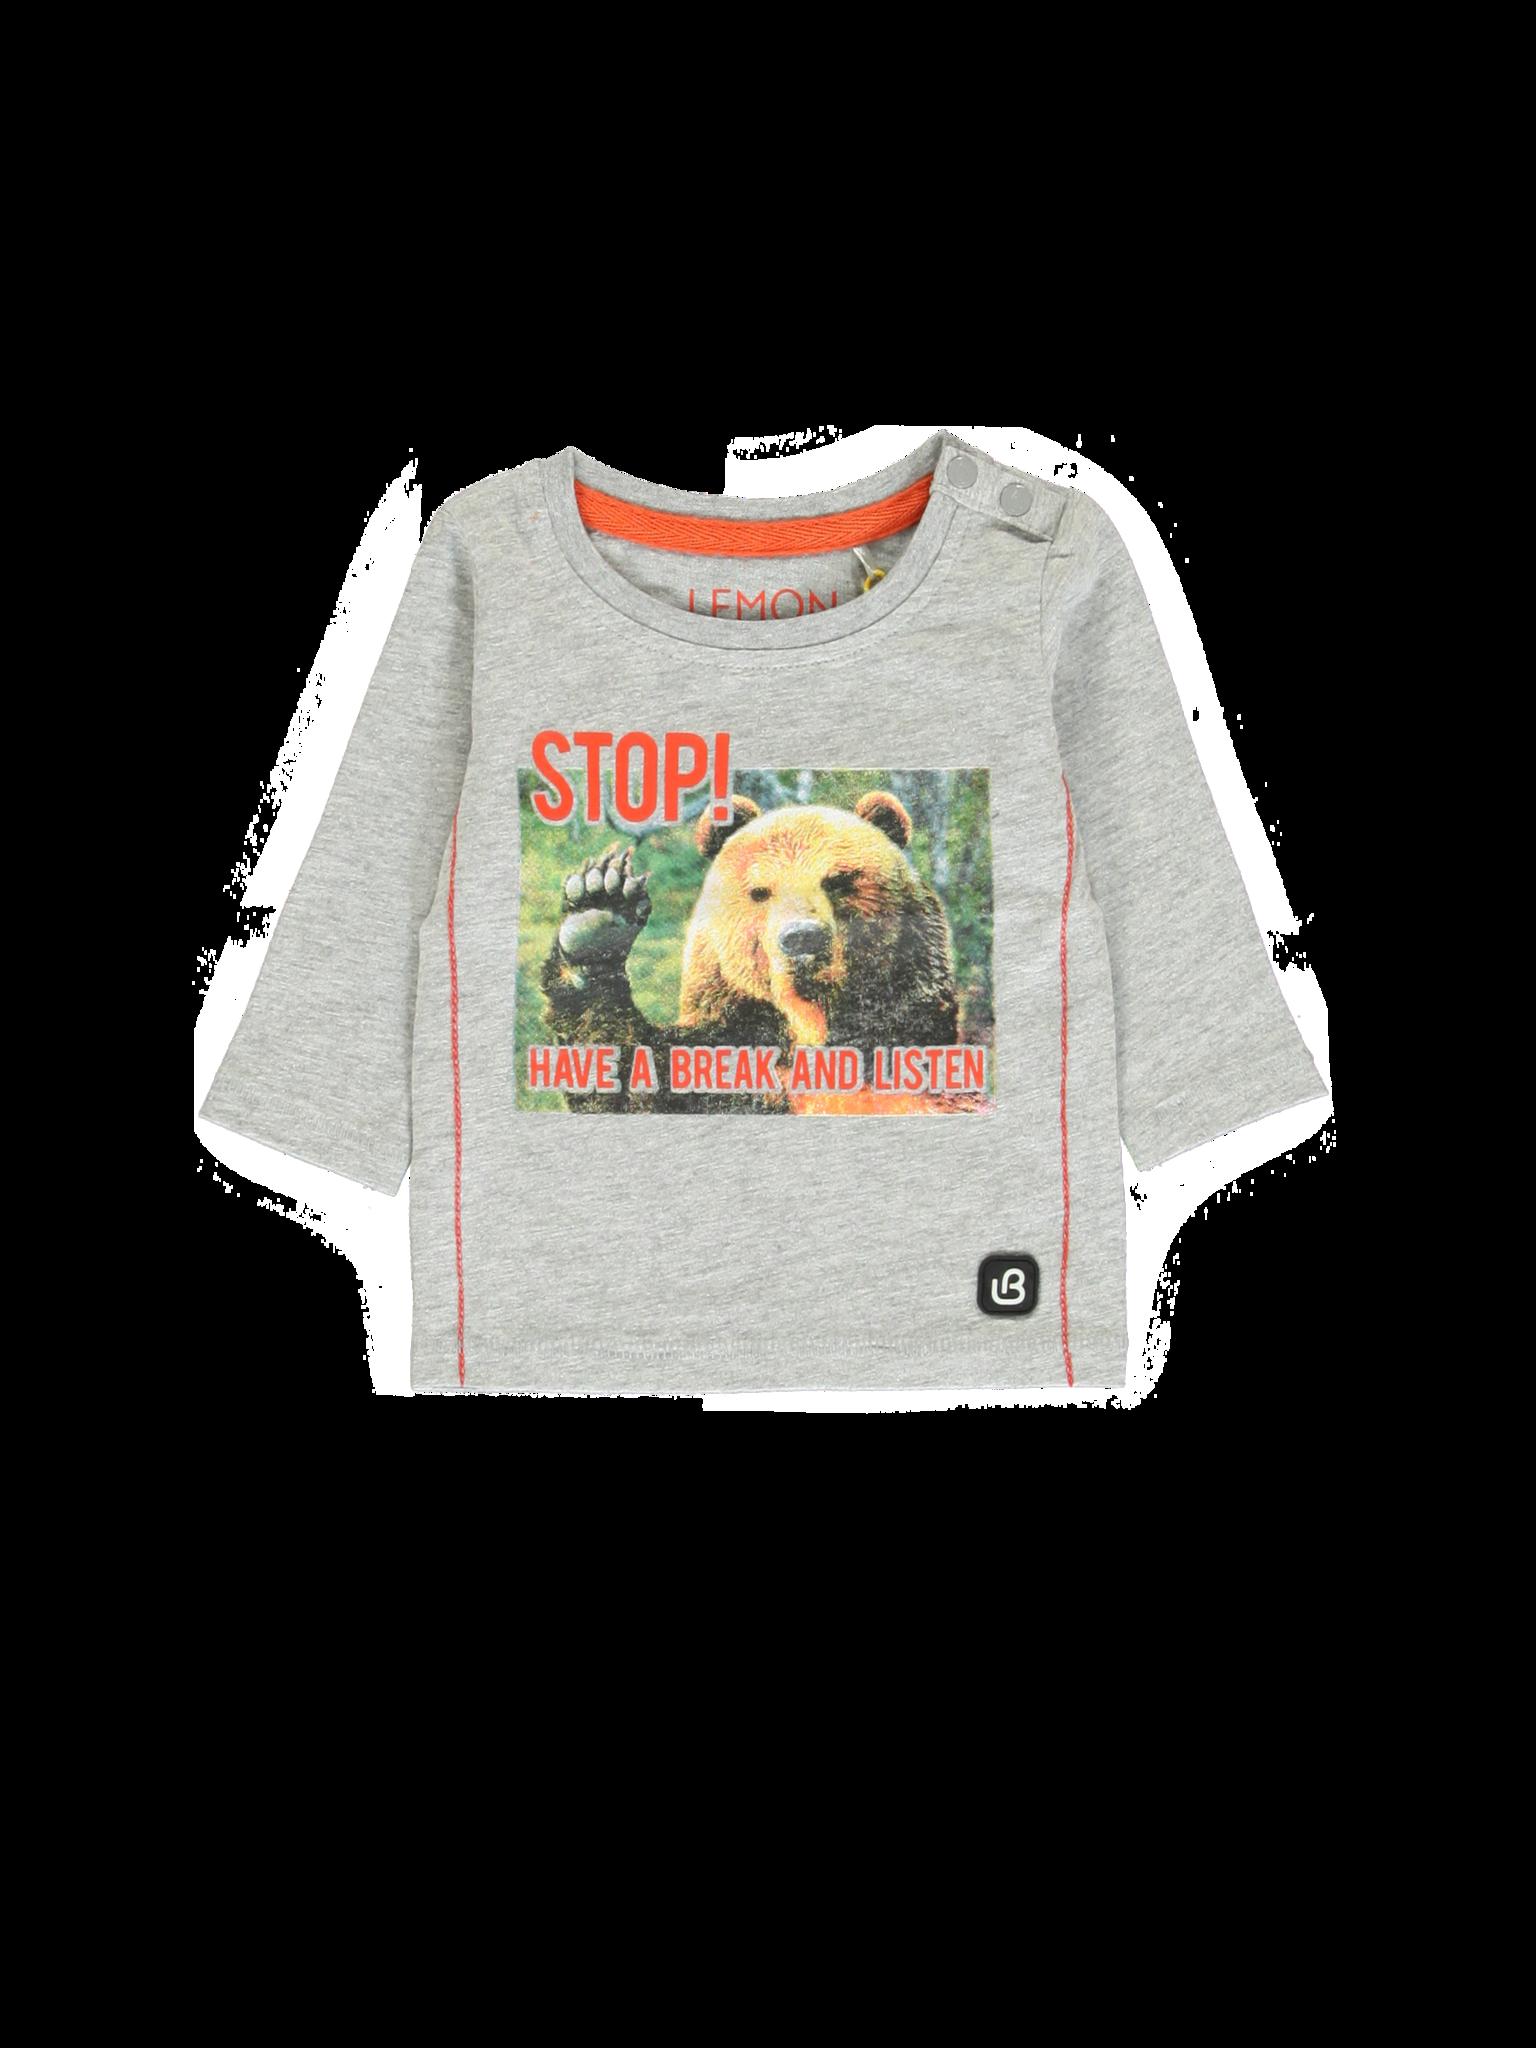 All Brands | Winterproducts Baby | T-shirt | 12 pcs/box